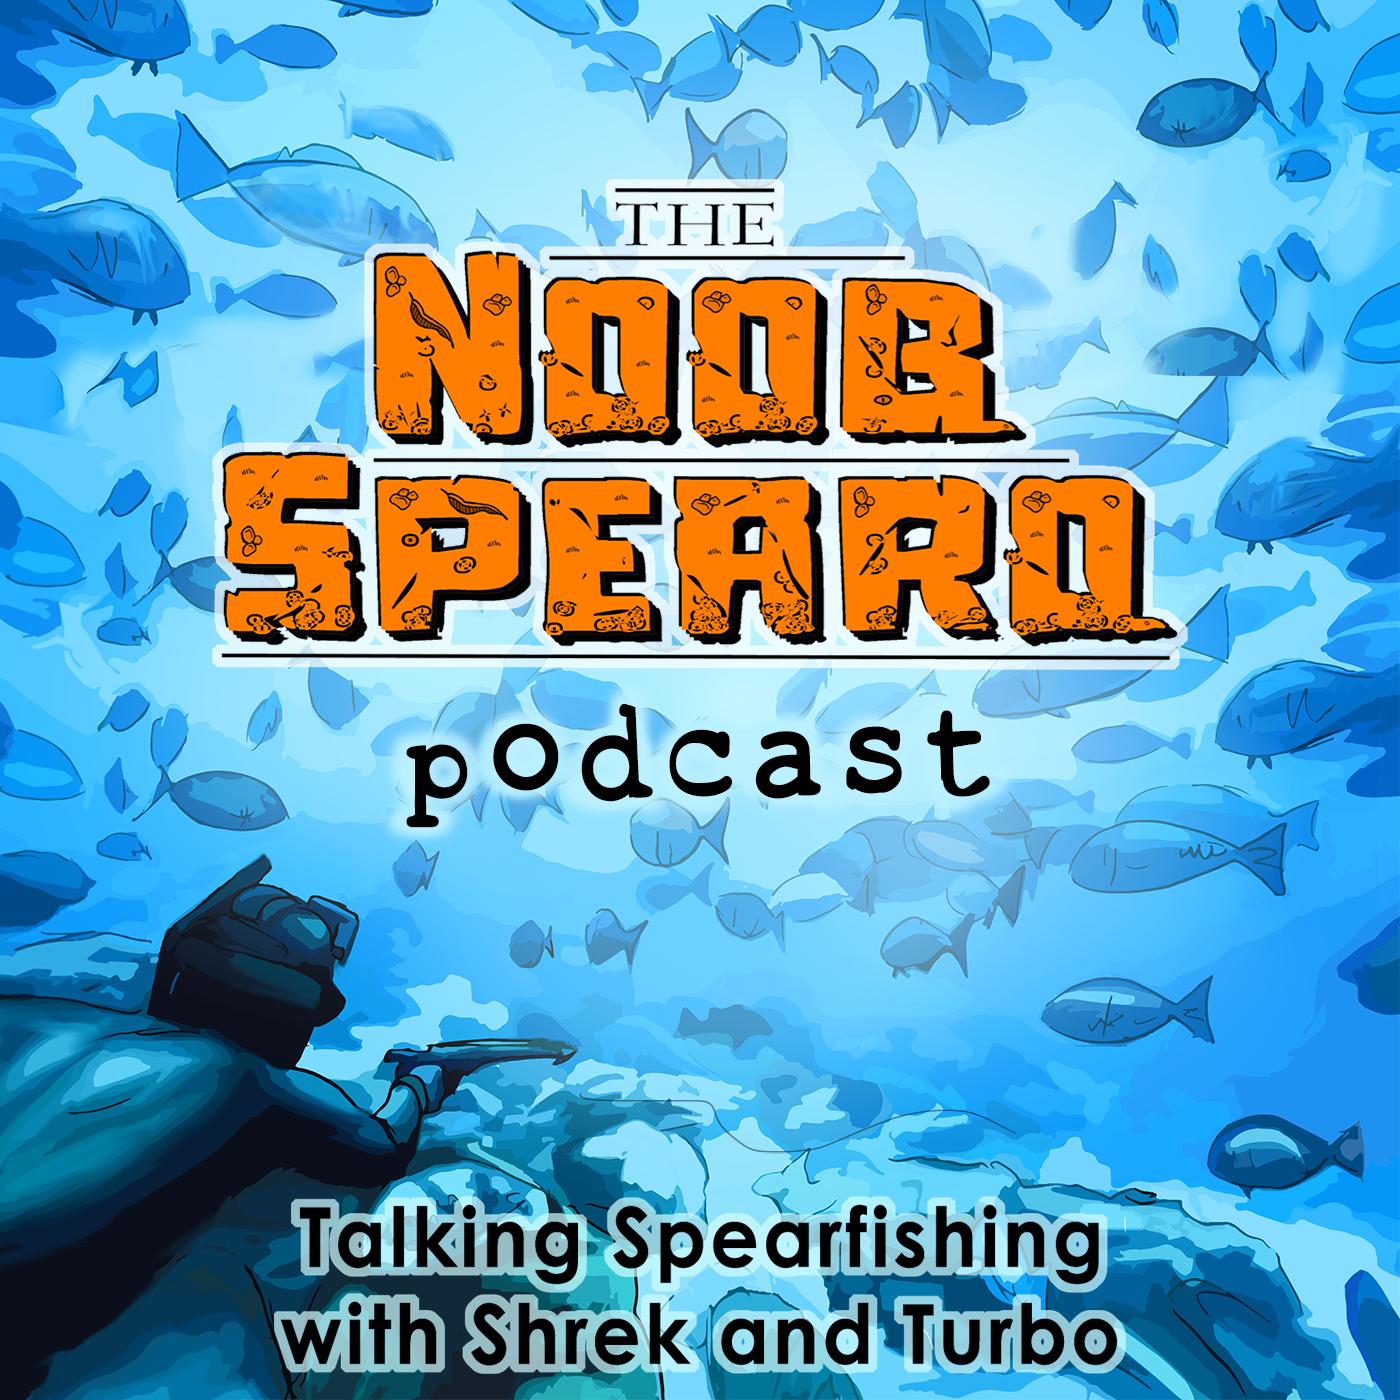 Noob Spearo Podcast